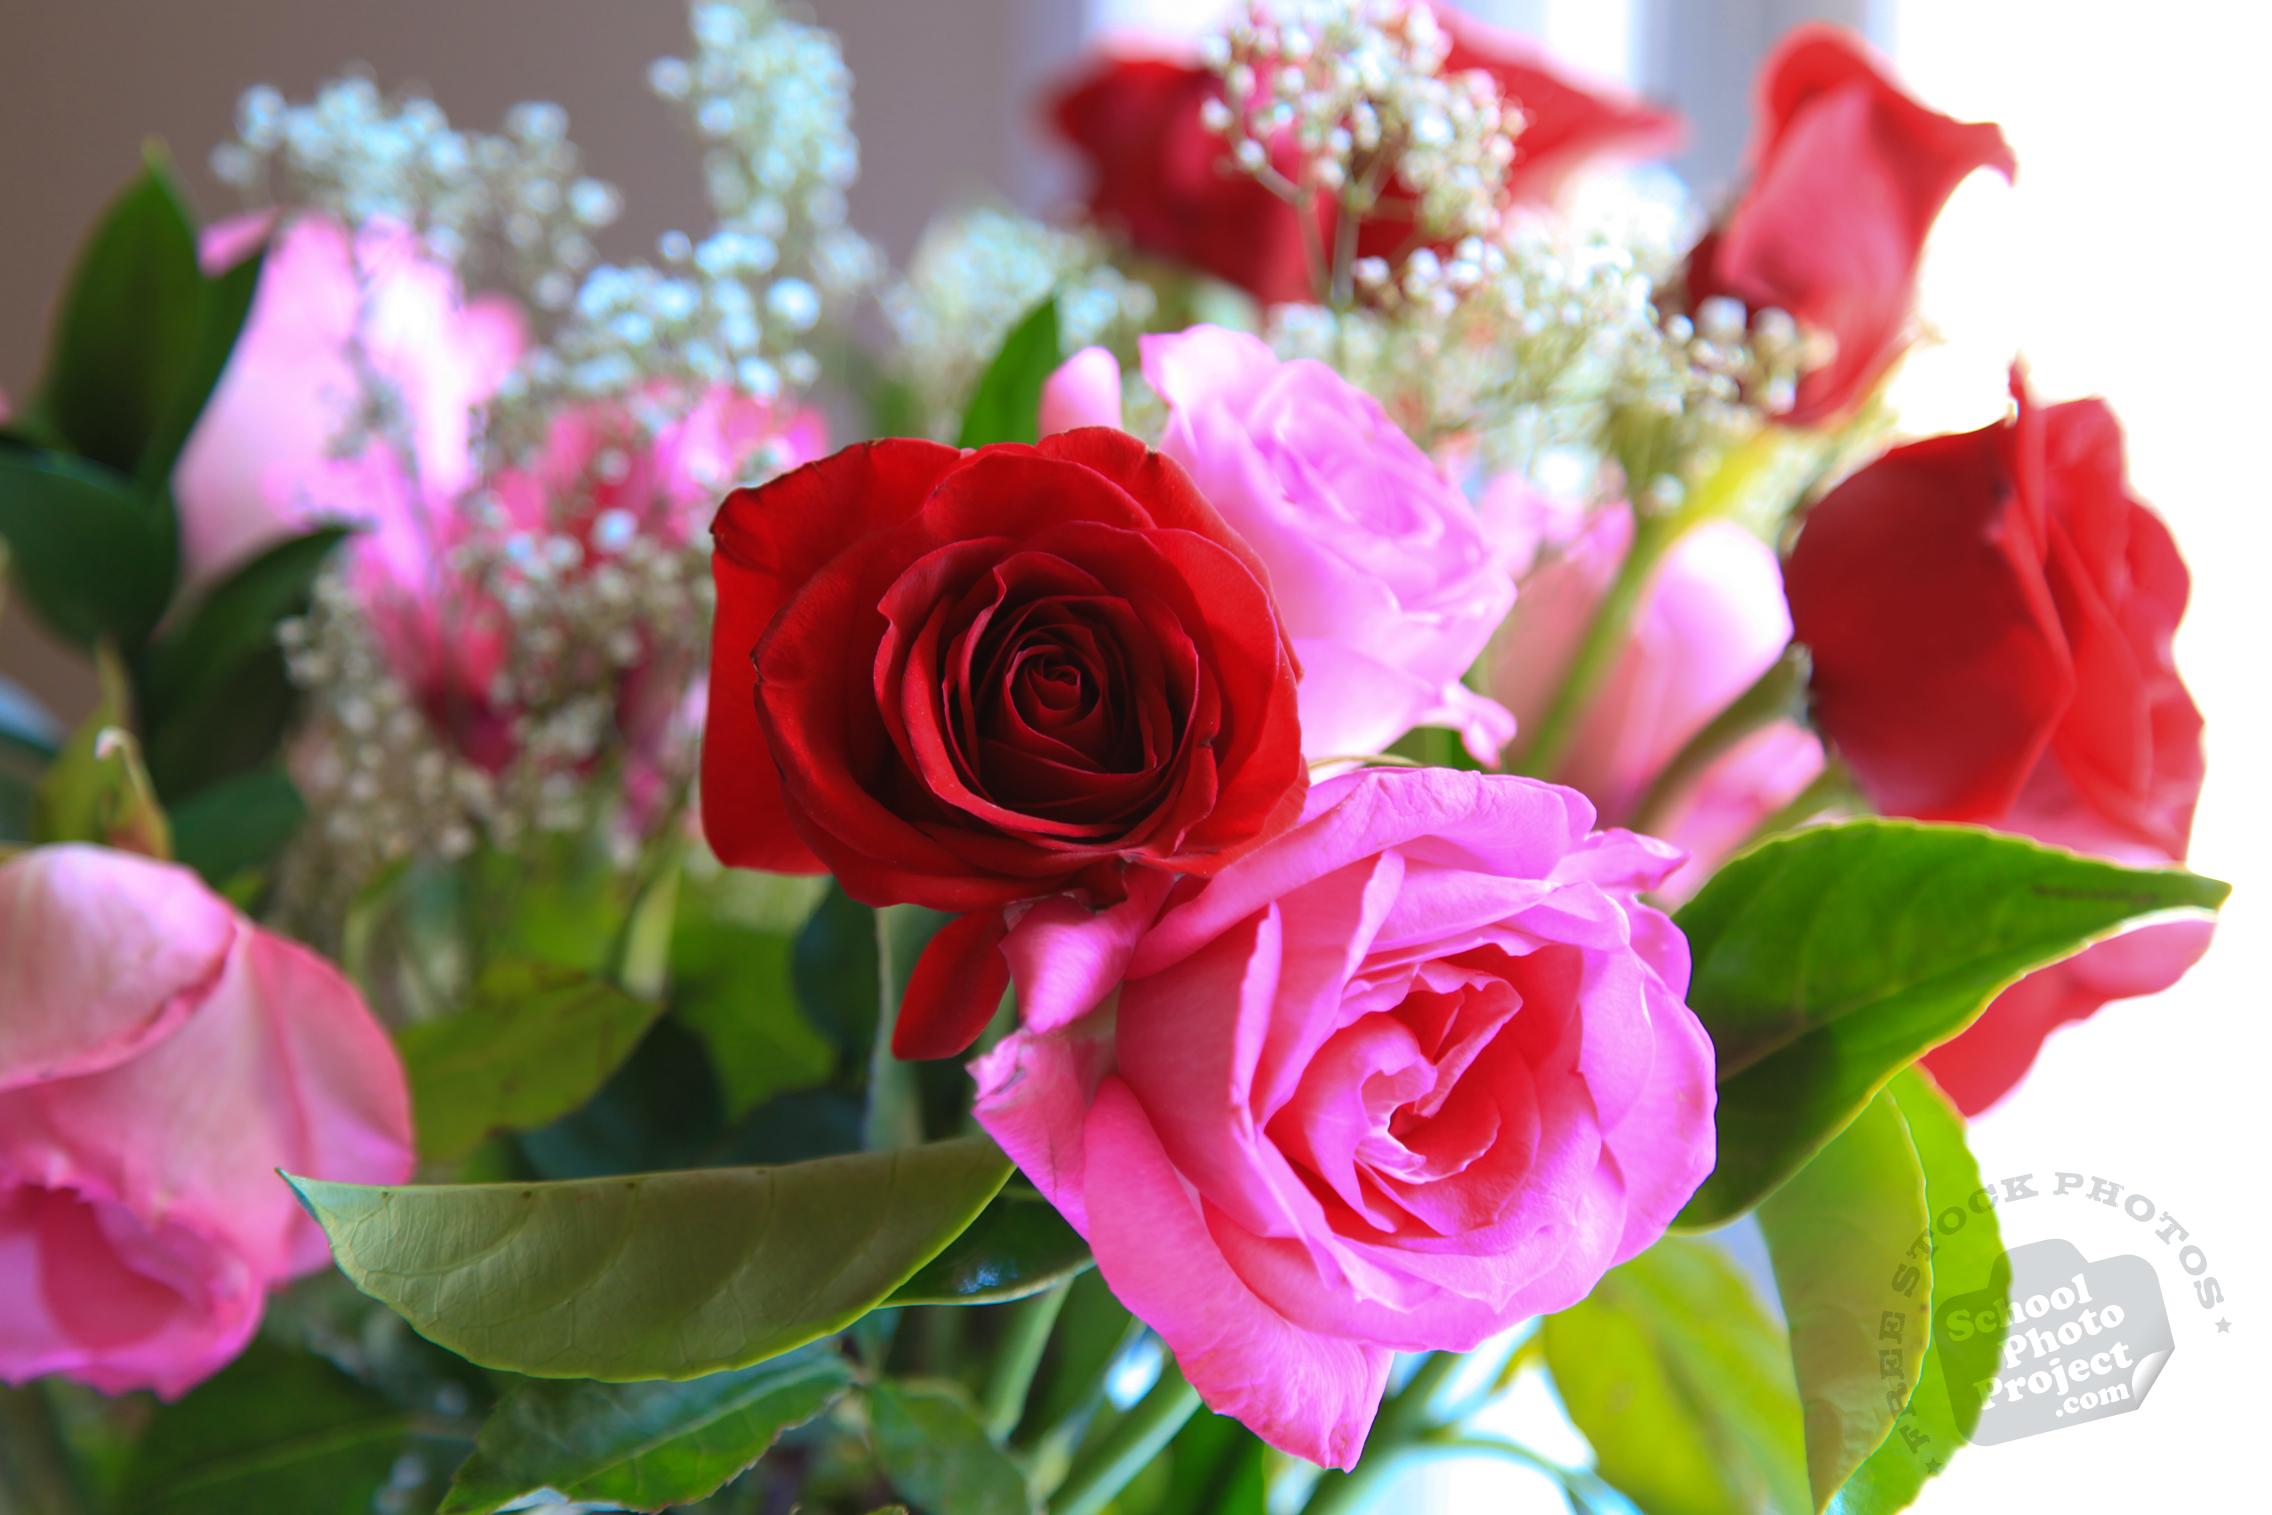 Free images of valentine flowers image transparent stock Fresh Roses, FREE Stock Photo, Image, Picture: Valentine's Day Red ... image transparent stock